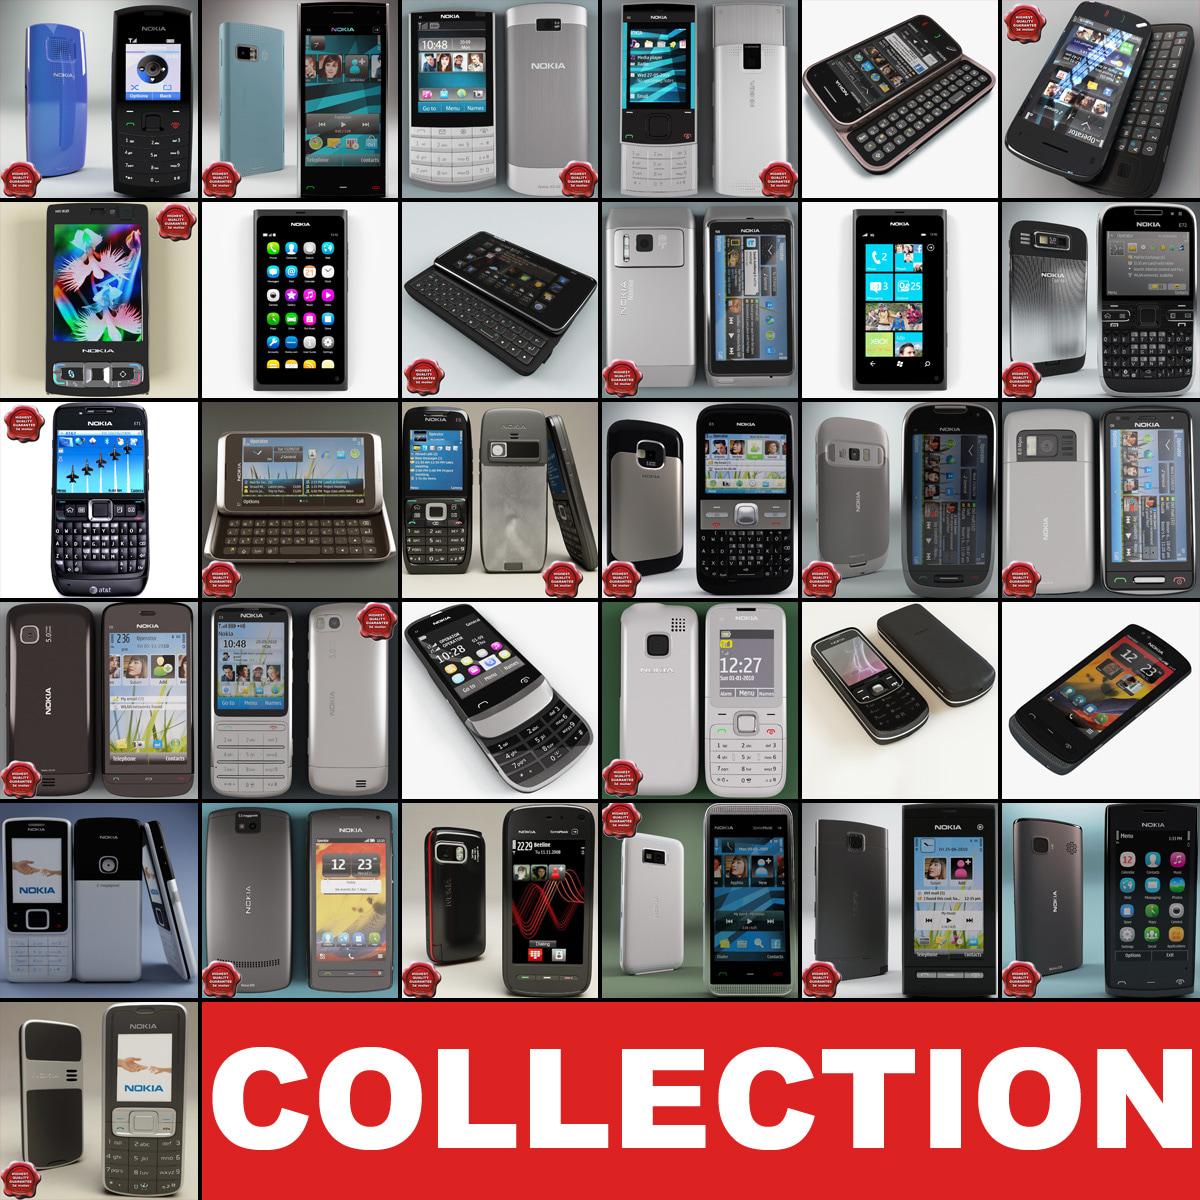 Nokia Phones Collection V13